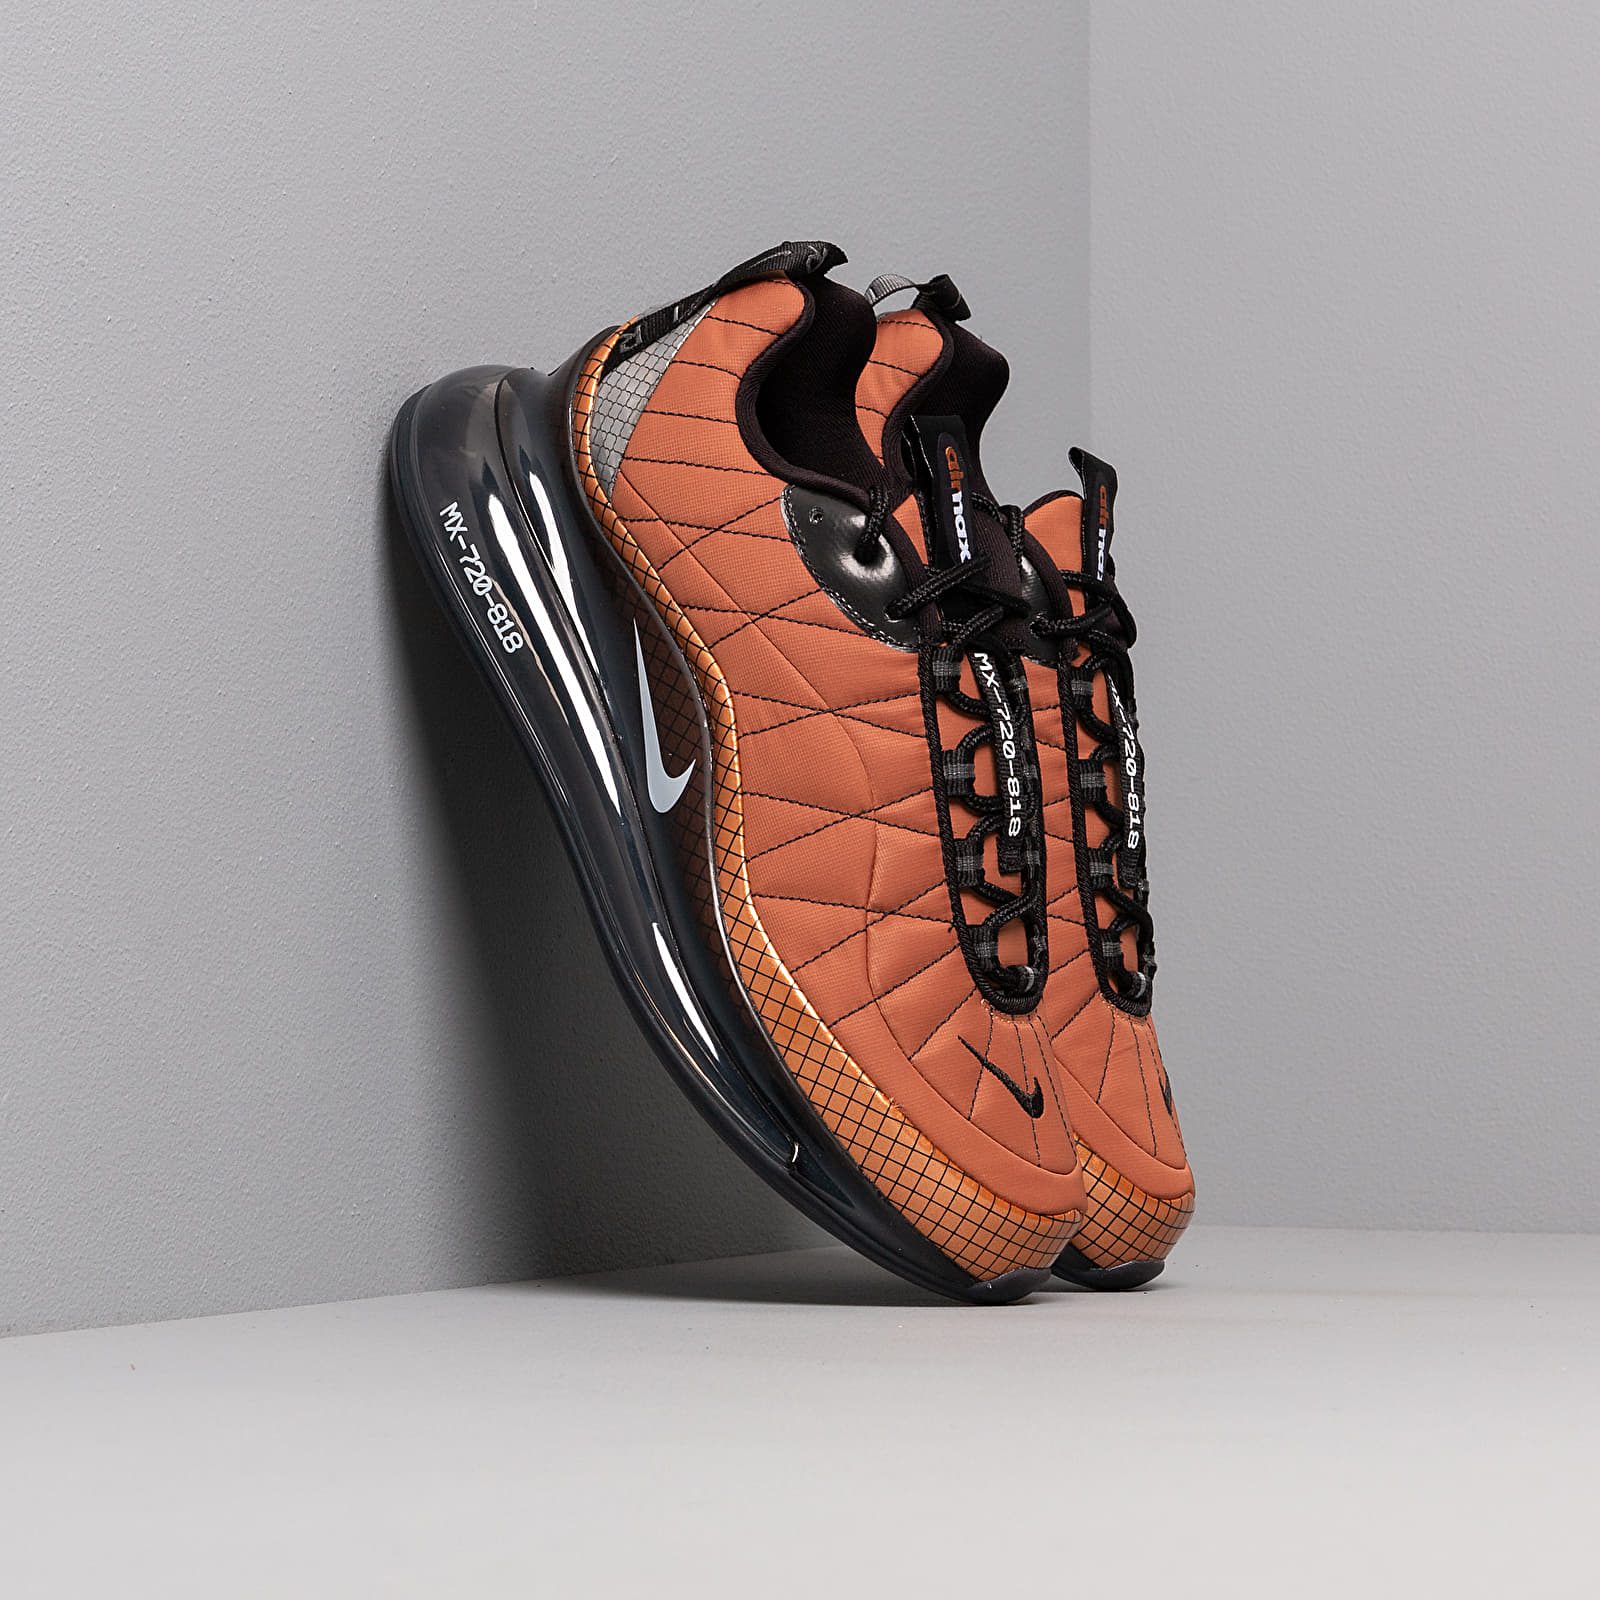 Pánské tenisky a boty Nike Mx-720-818 Metallic Copper/ White-Black-Anthracite